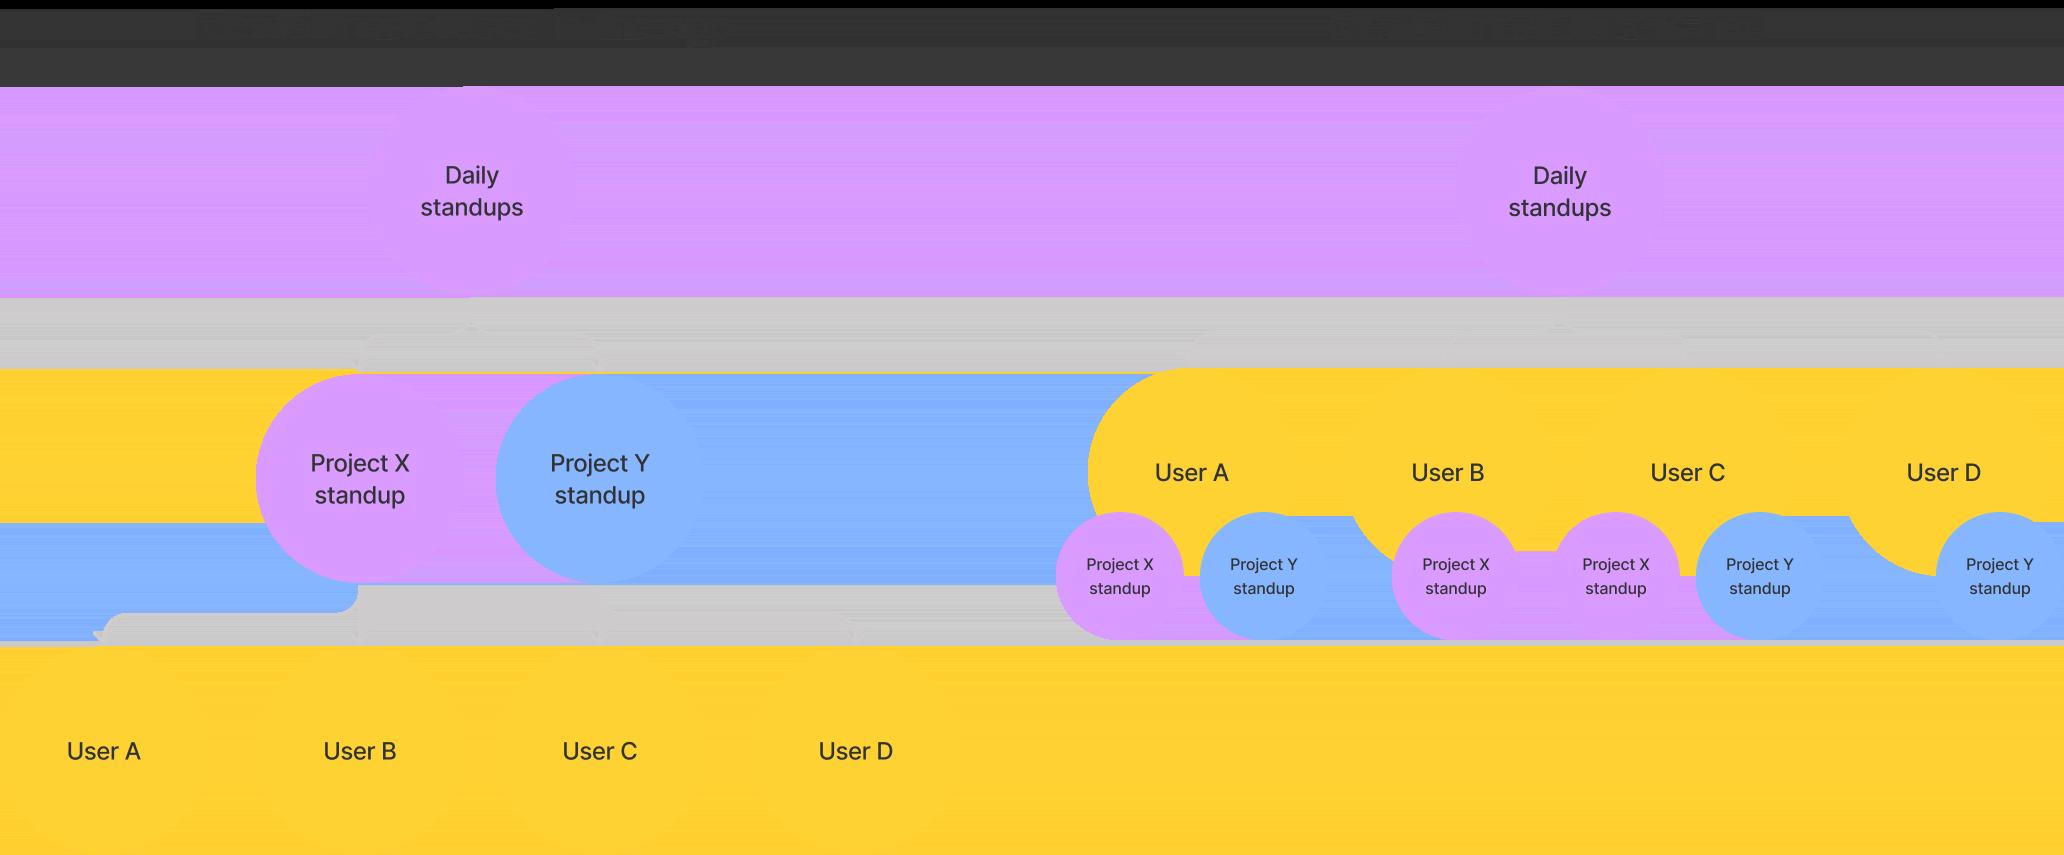 Identifi mental models